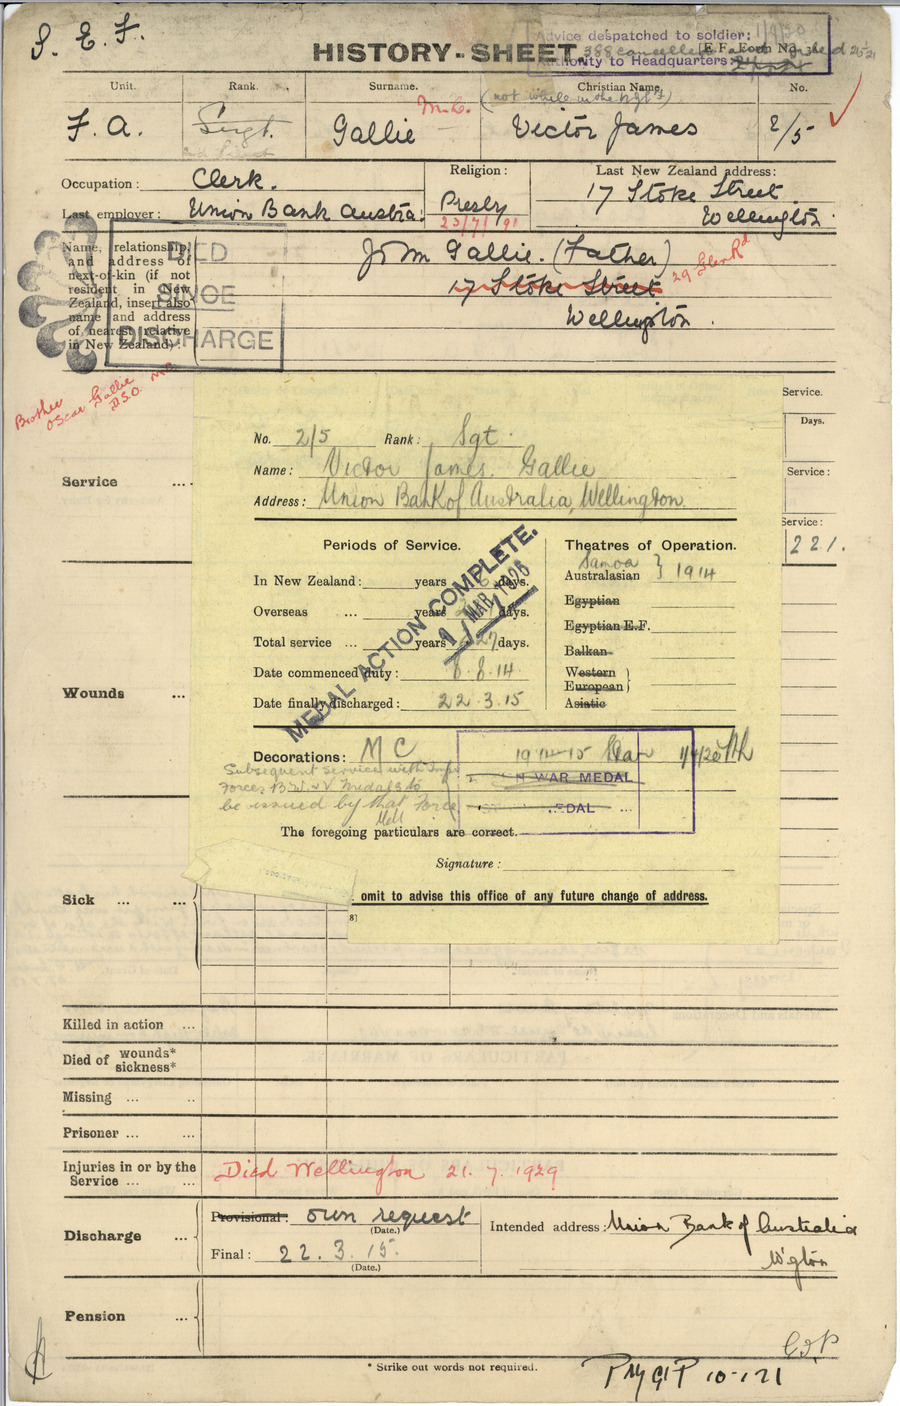 Gallie VJ History Sheet